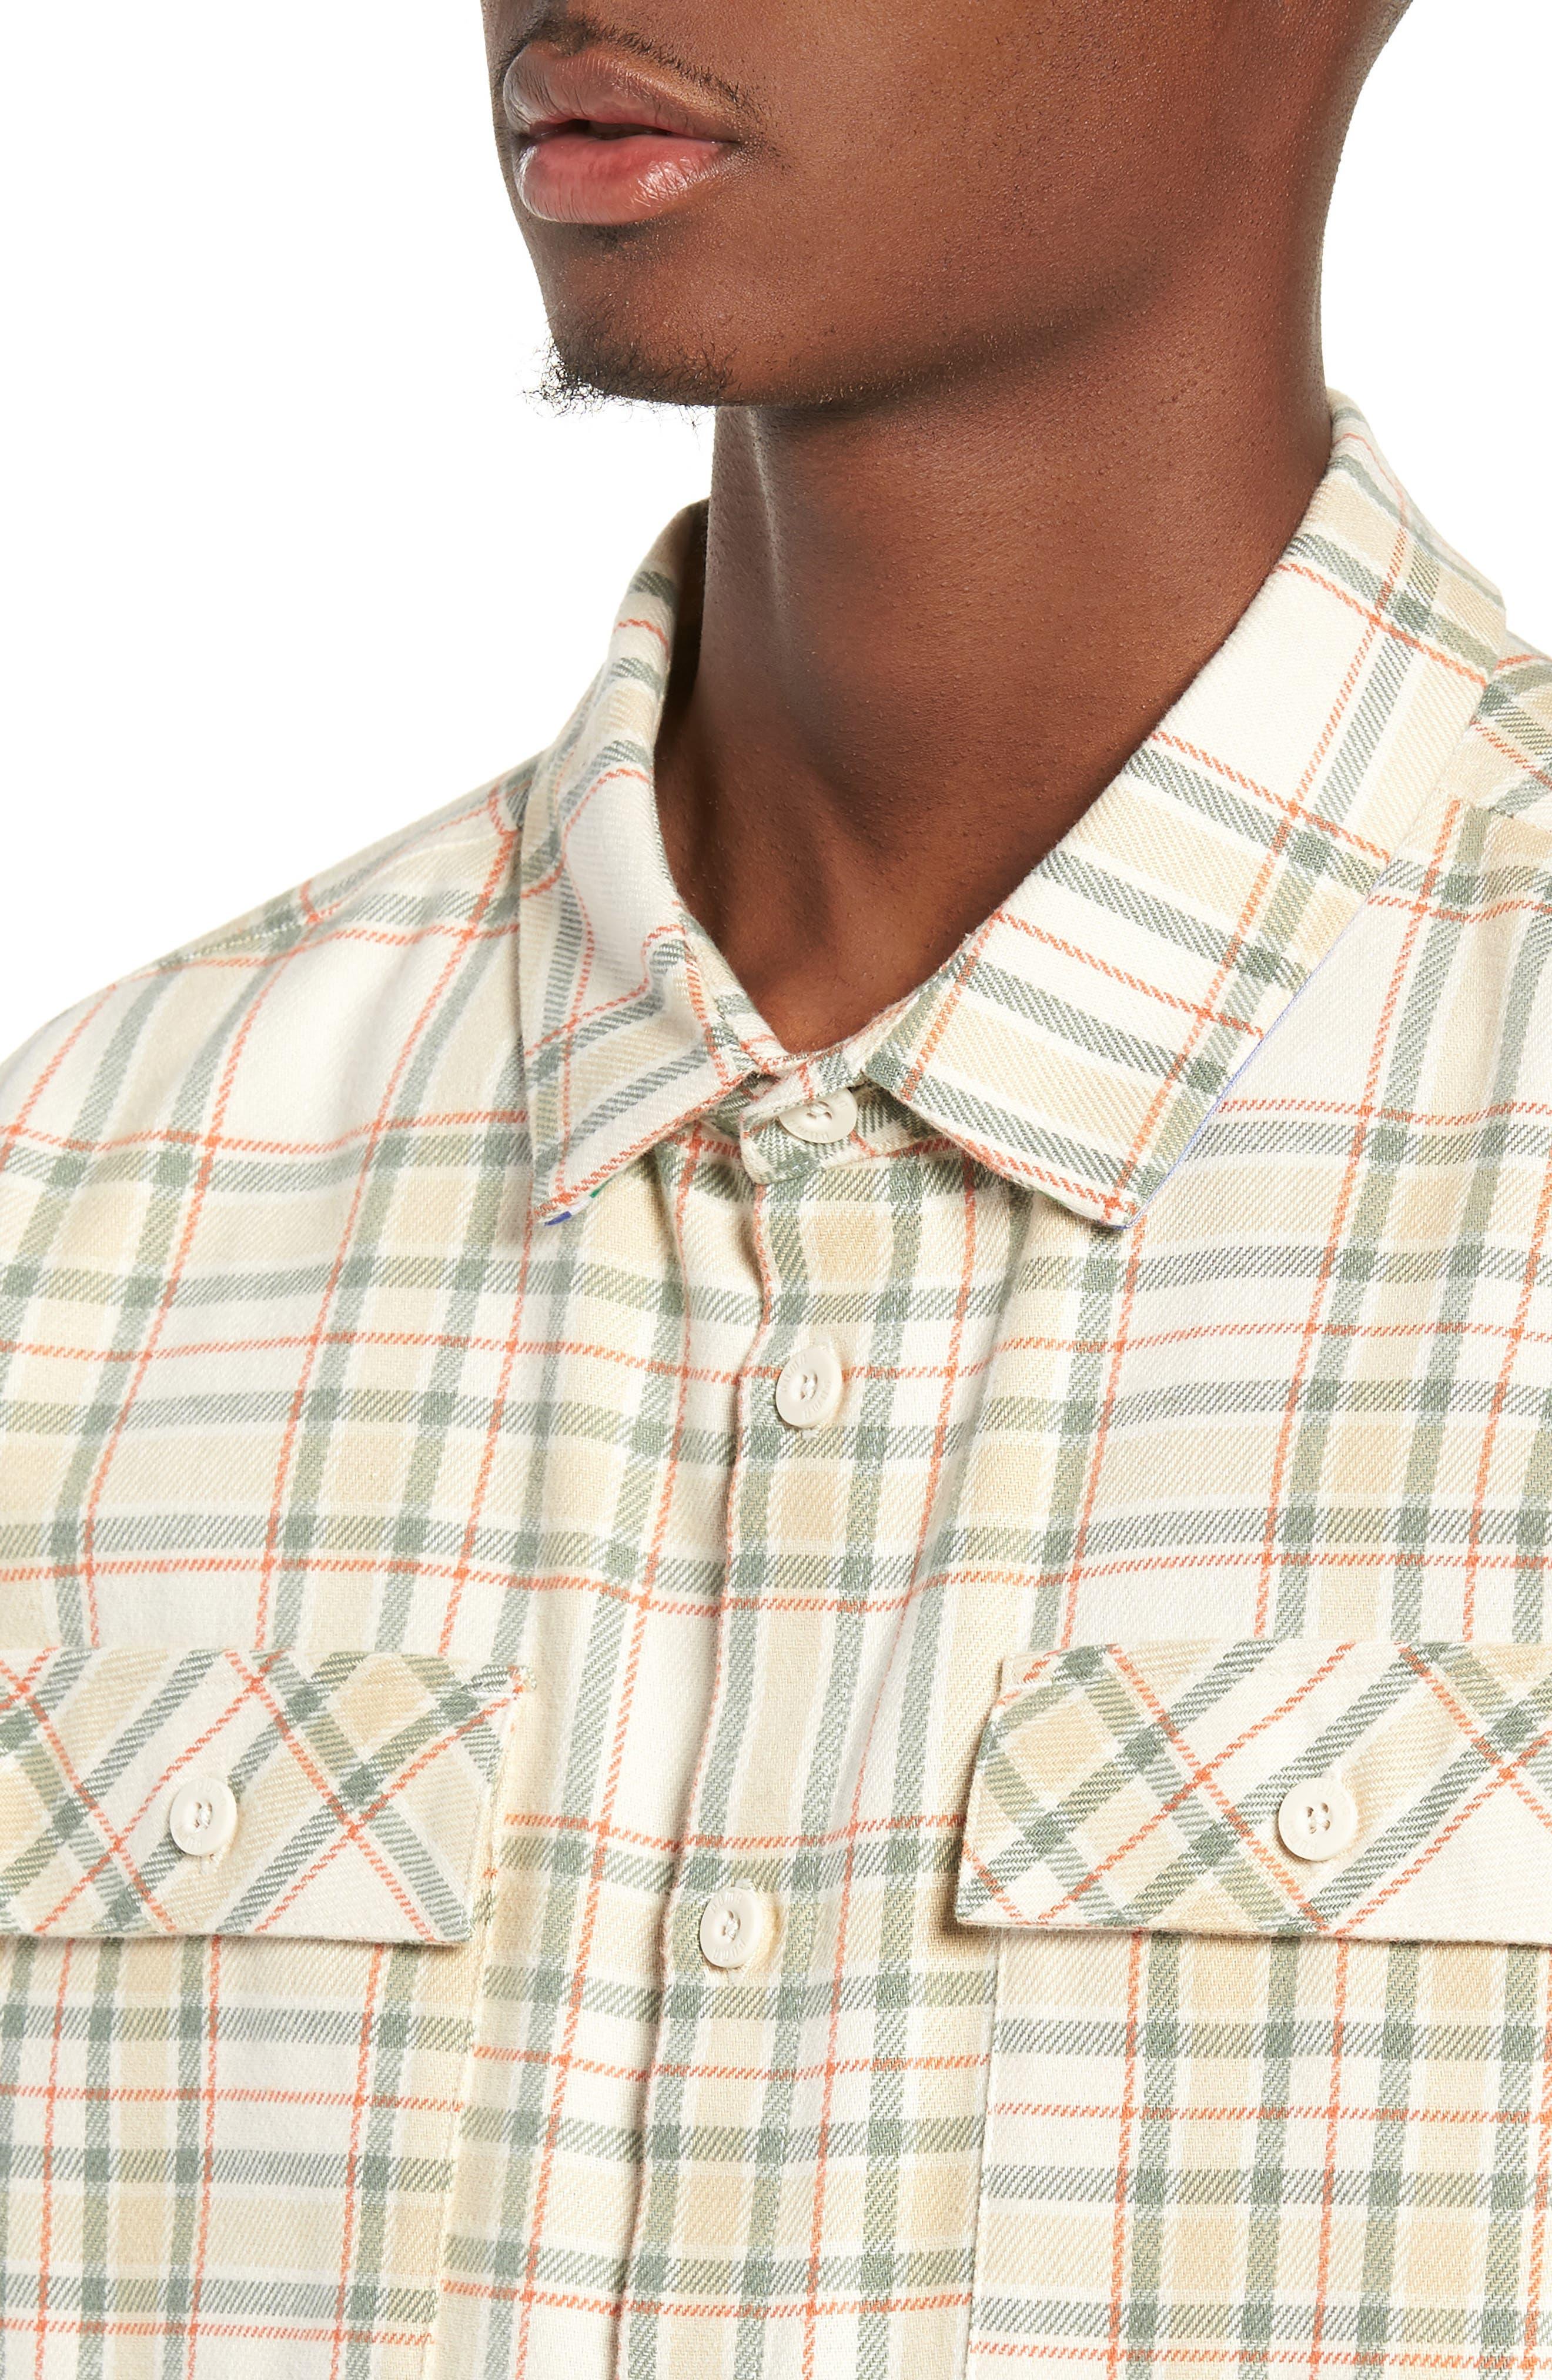 PUMA,                             x Big Sean Check Shirt,                             Alternate thumbnail 4, color,                             100